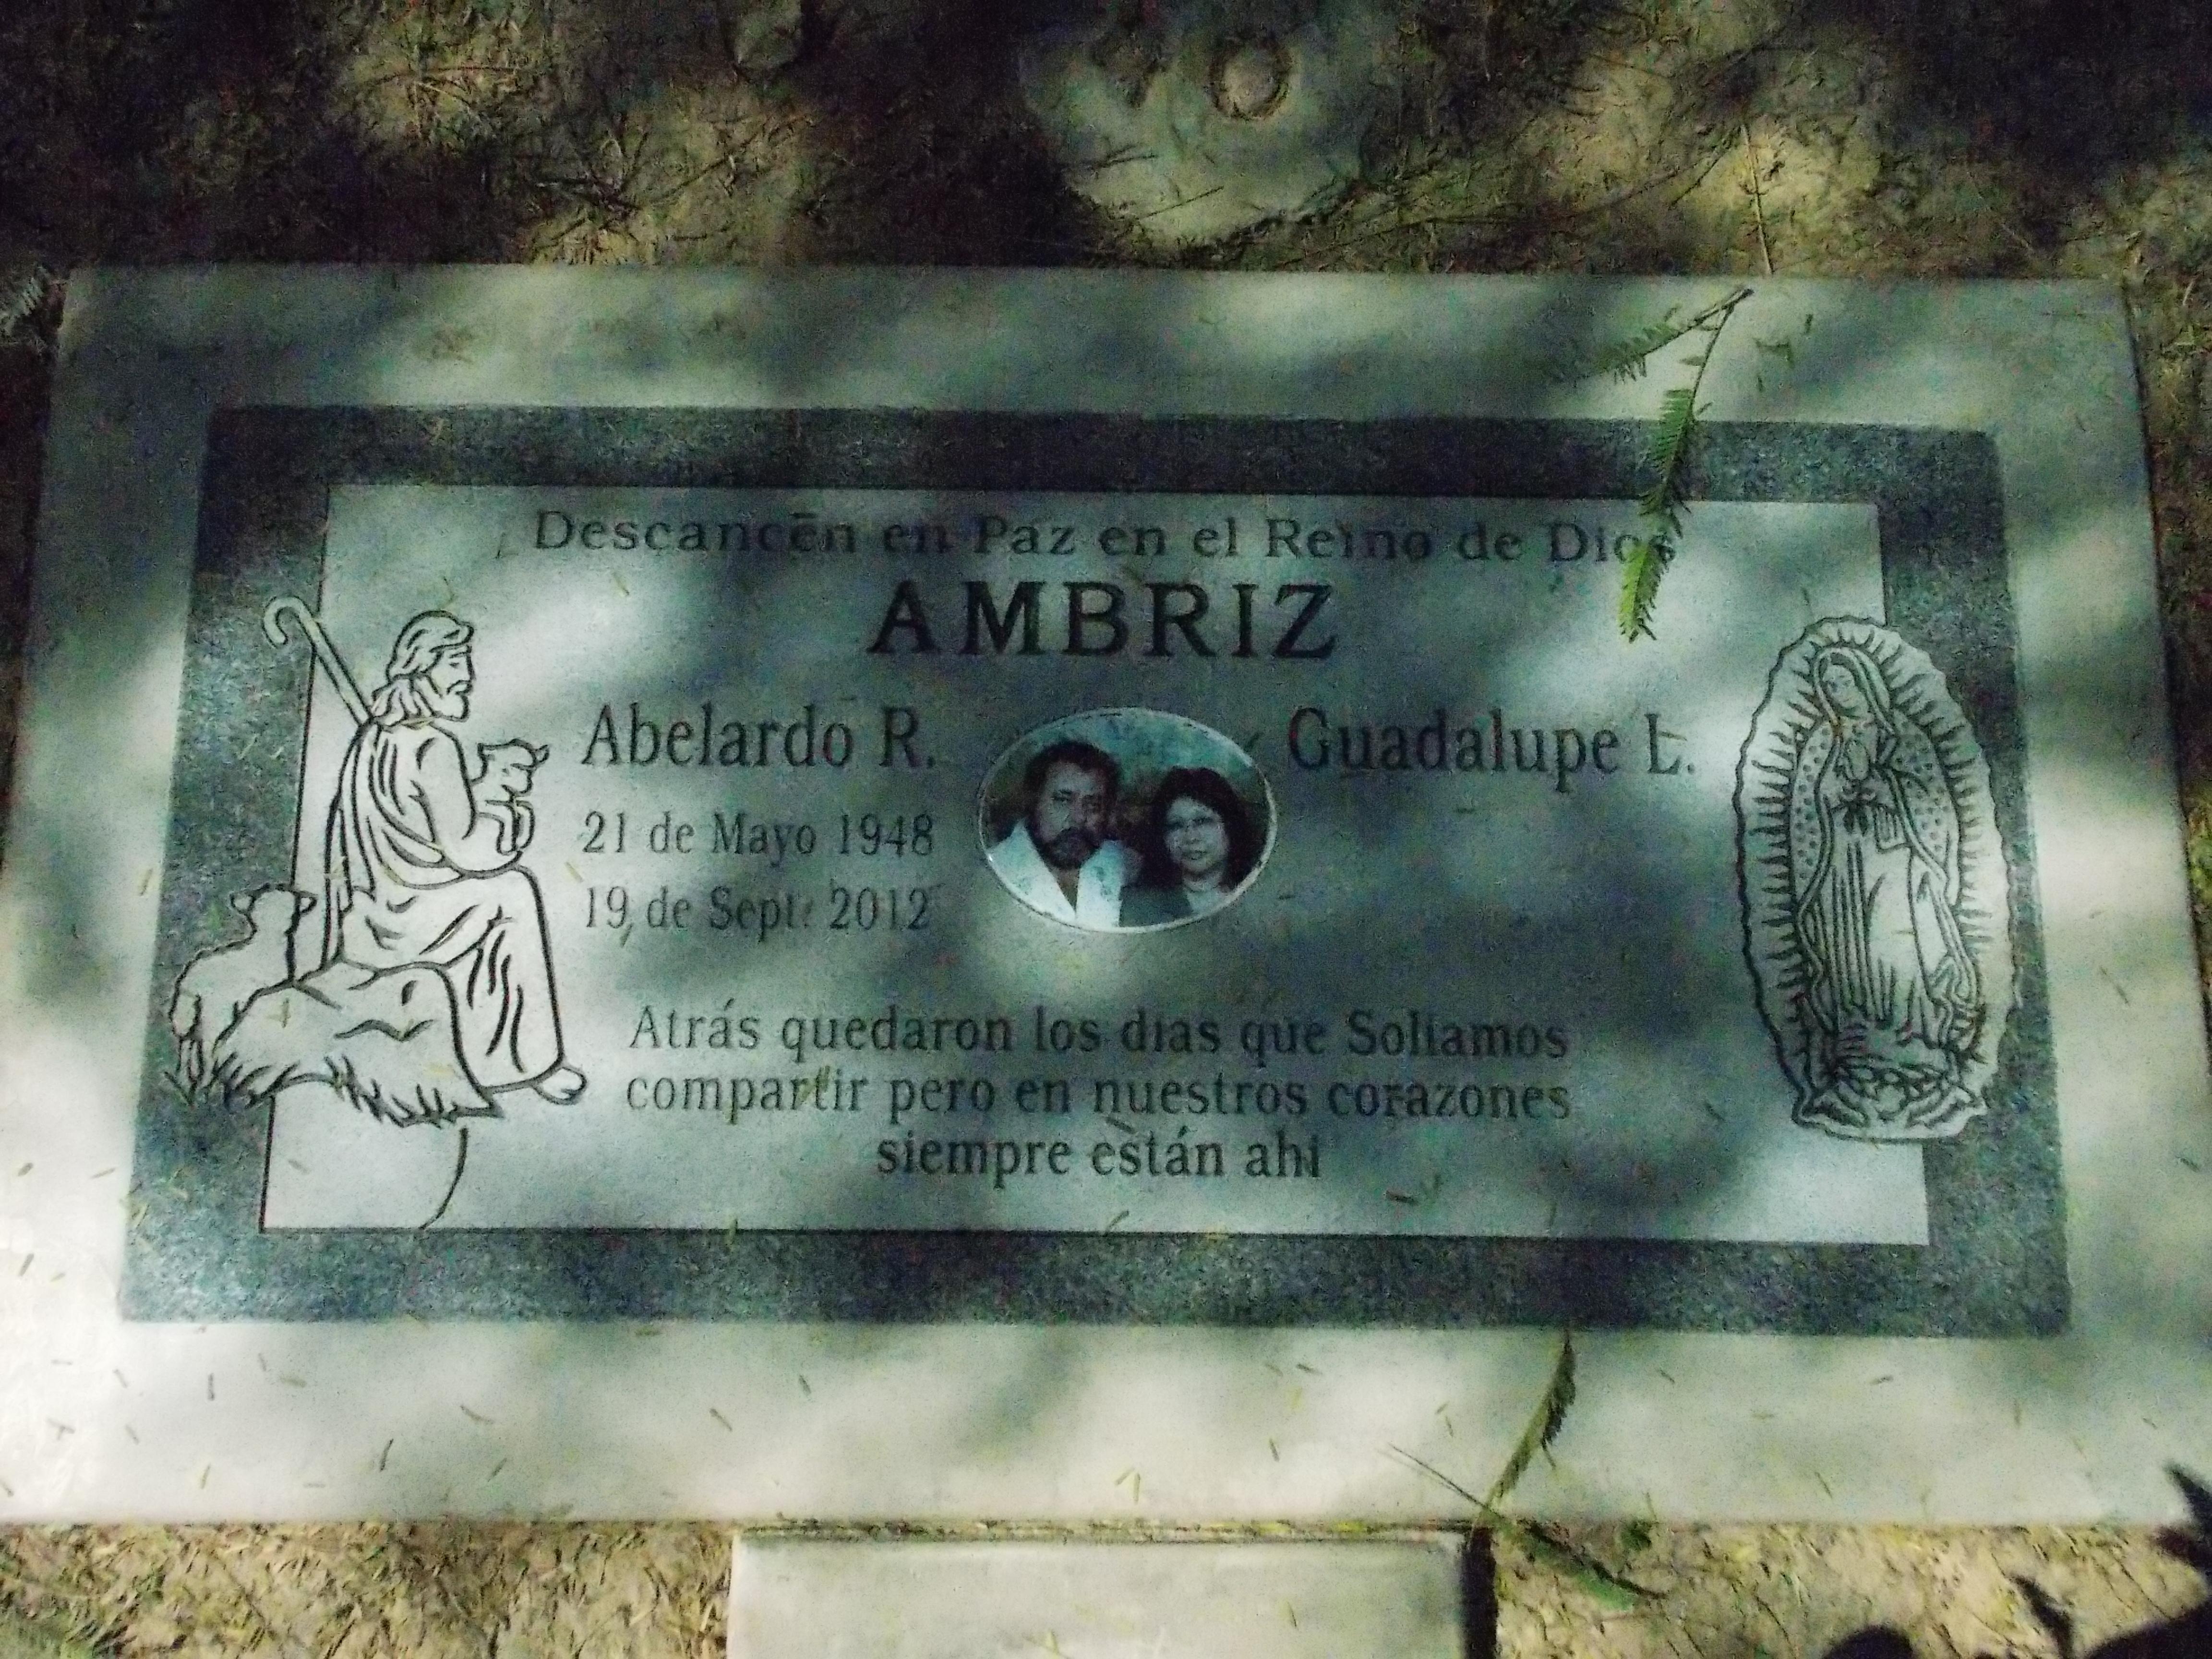 Abelardo Ruiz Ambriz